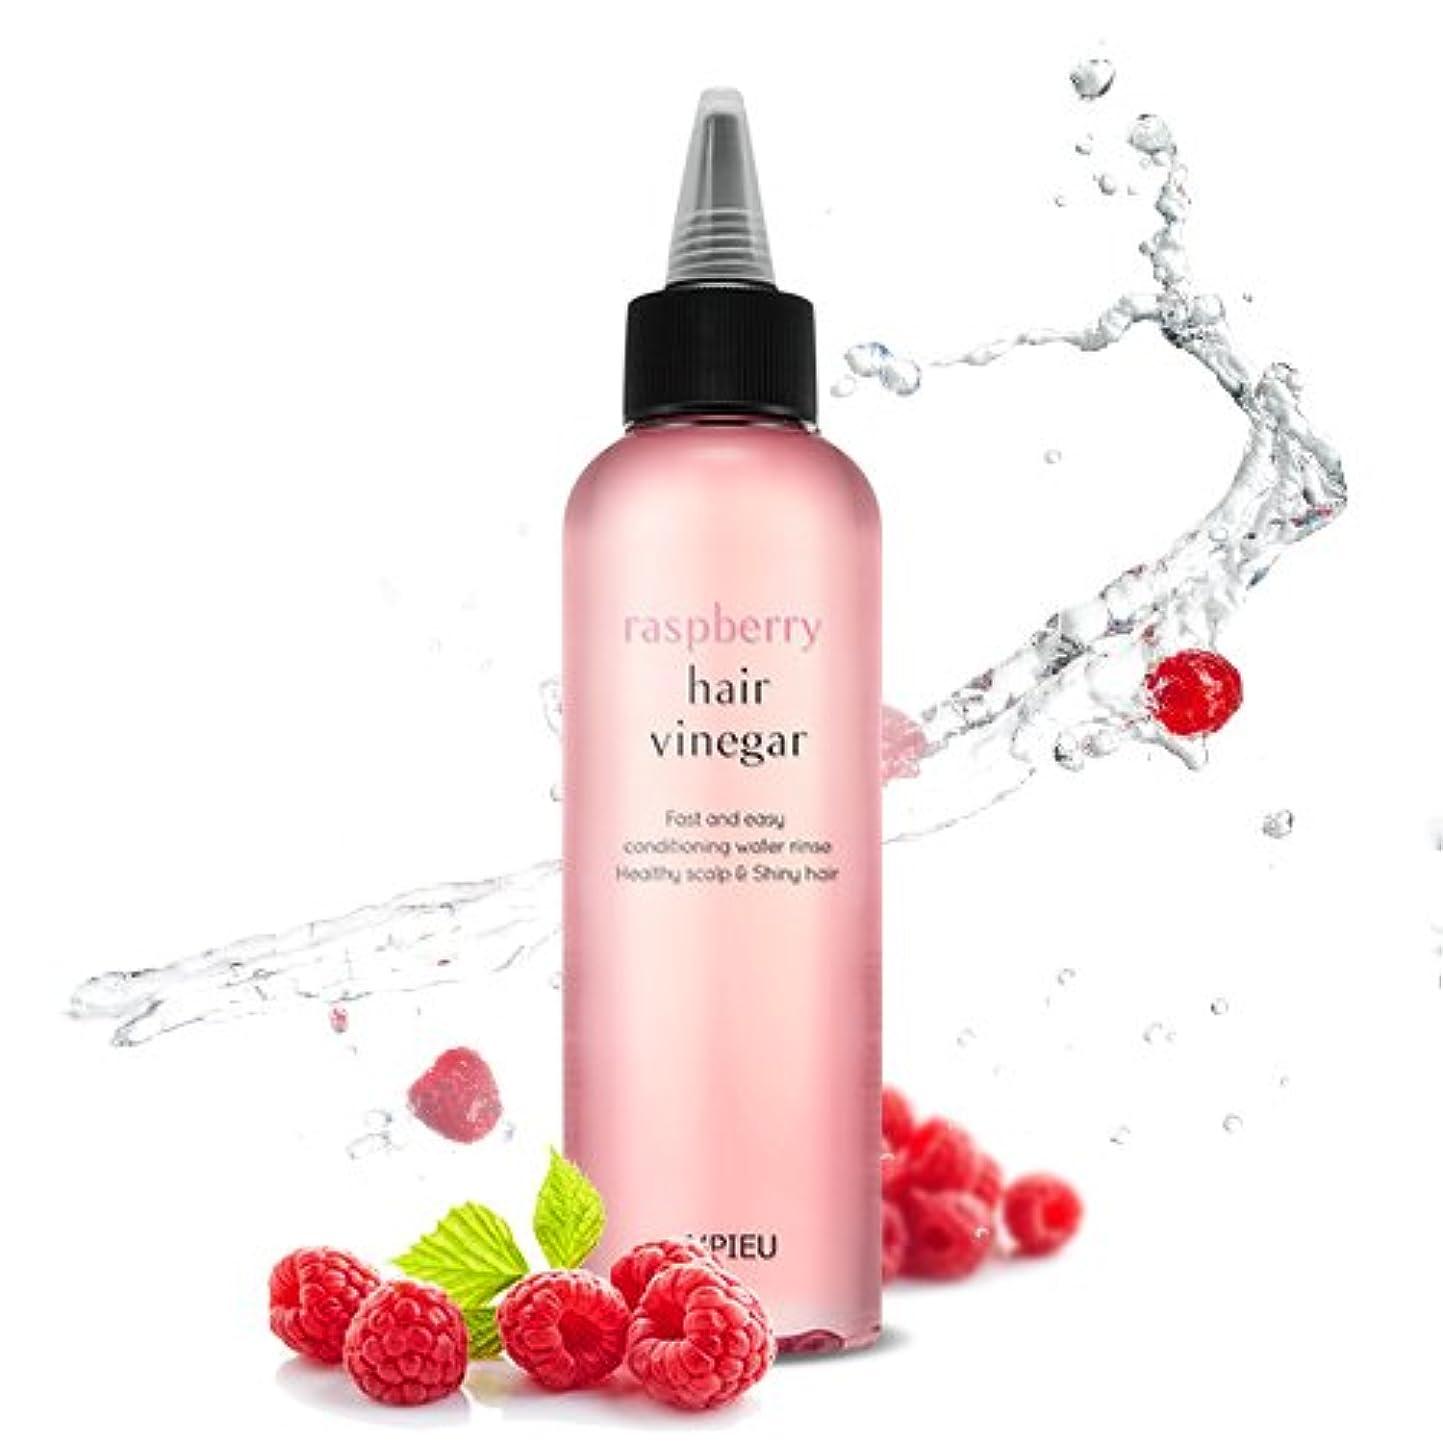 APIEU Raspberry Hair Vinegar / [アピュ/オピュ] ラズベリーヘアビネガー 200ml [並行輸入品]